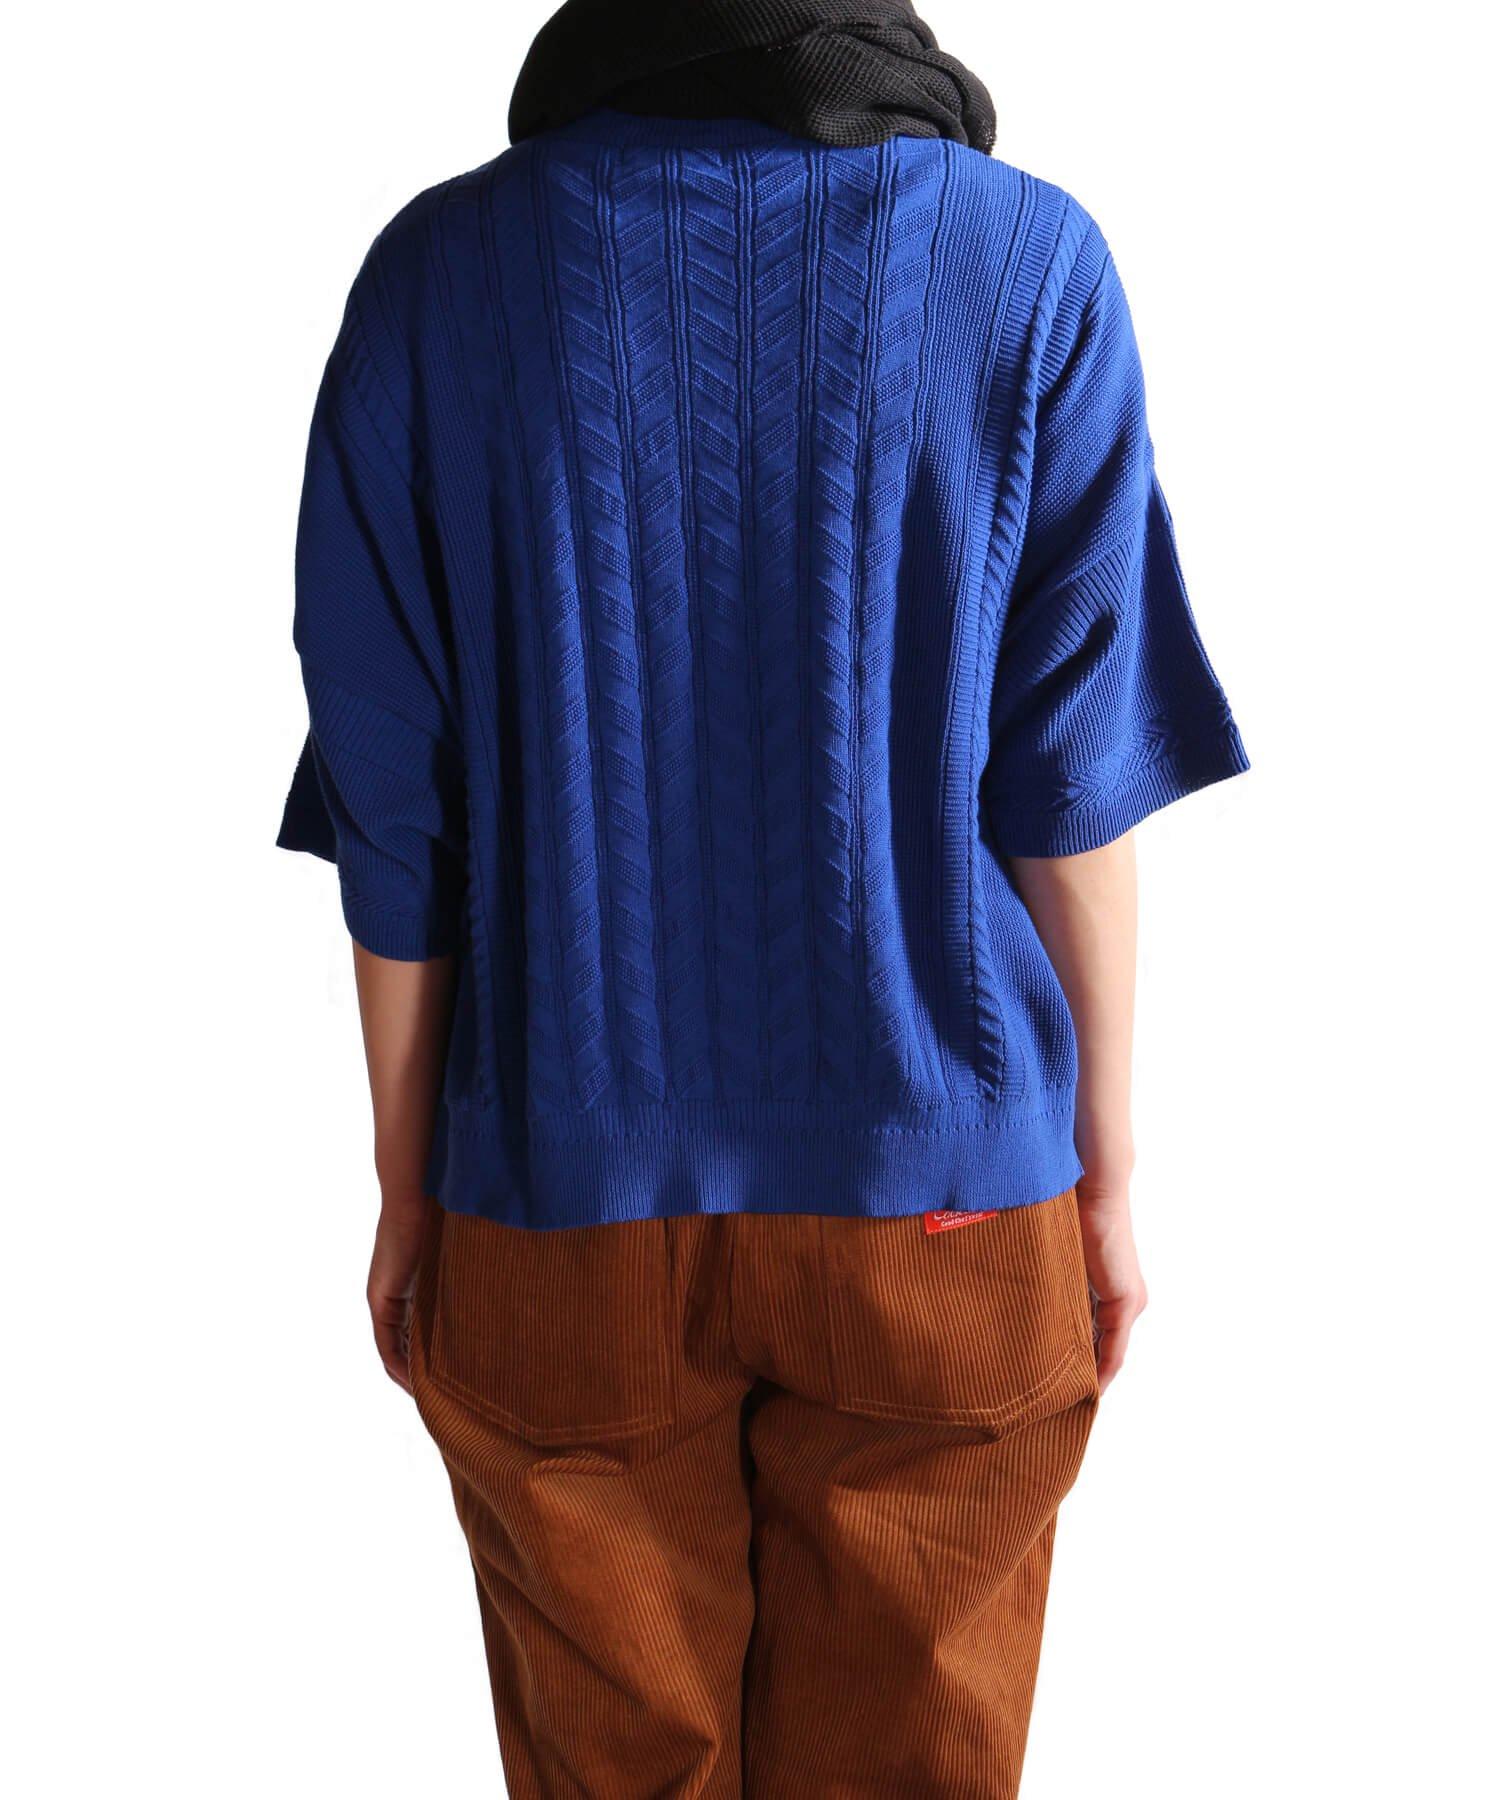 YASHIKI / ヤシキ |YASHIKI / ヤシキ × SIDEMILITIA inc. / サイドミリティア  RYUREI KNIT (LIMITED BLUE/WOMEN'S) 商品画像14